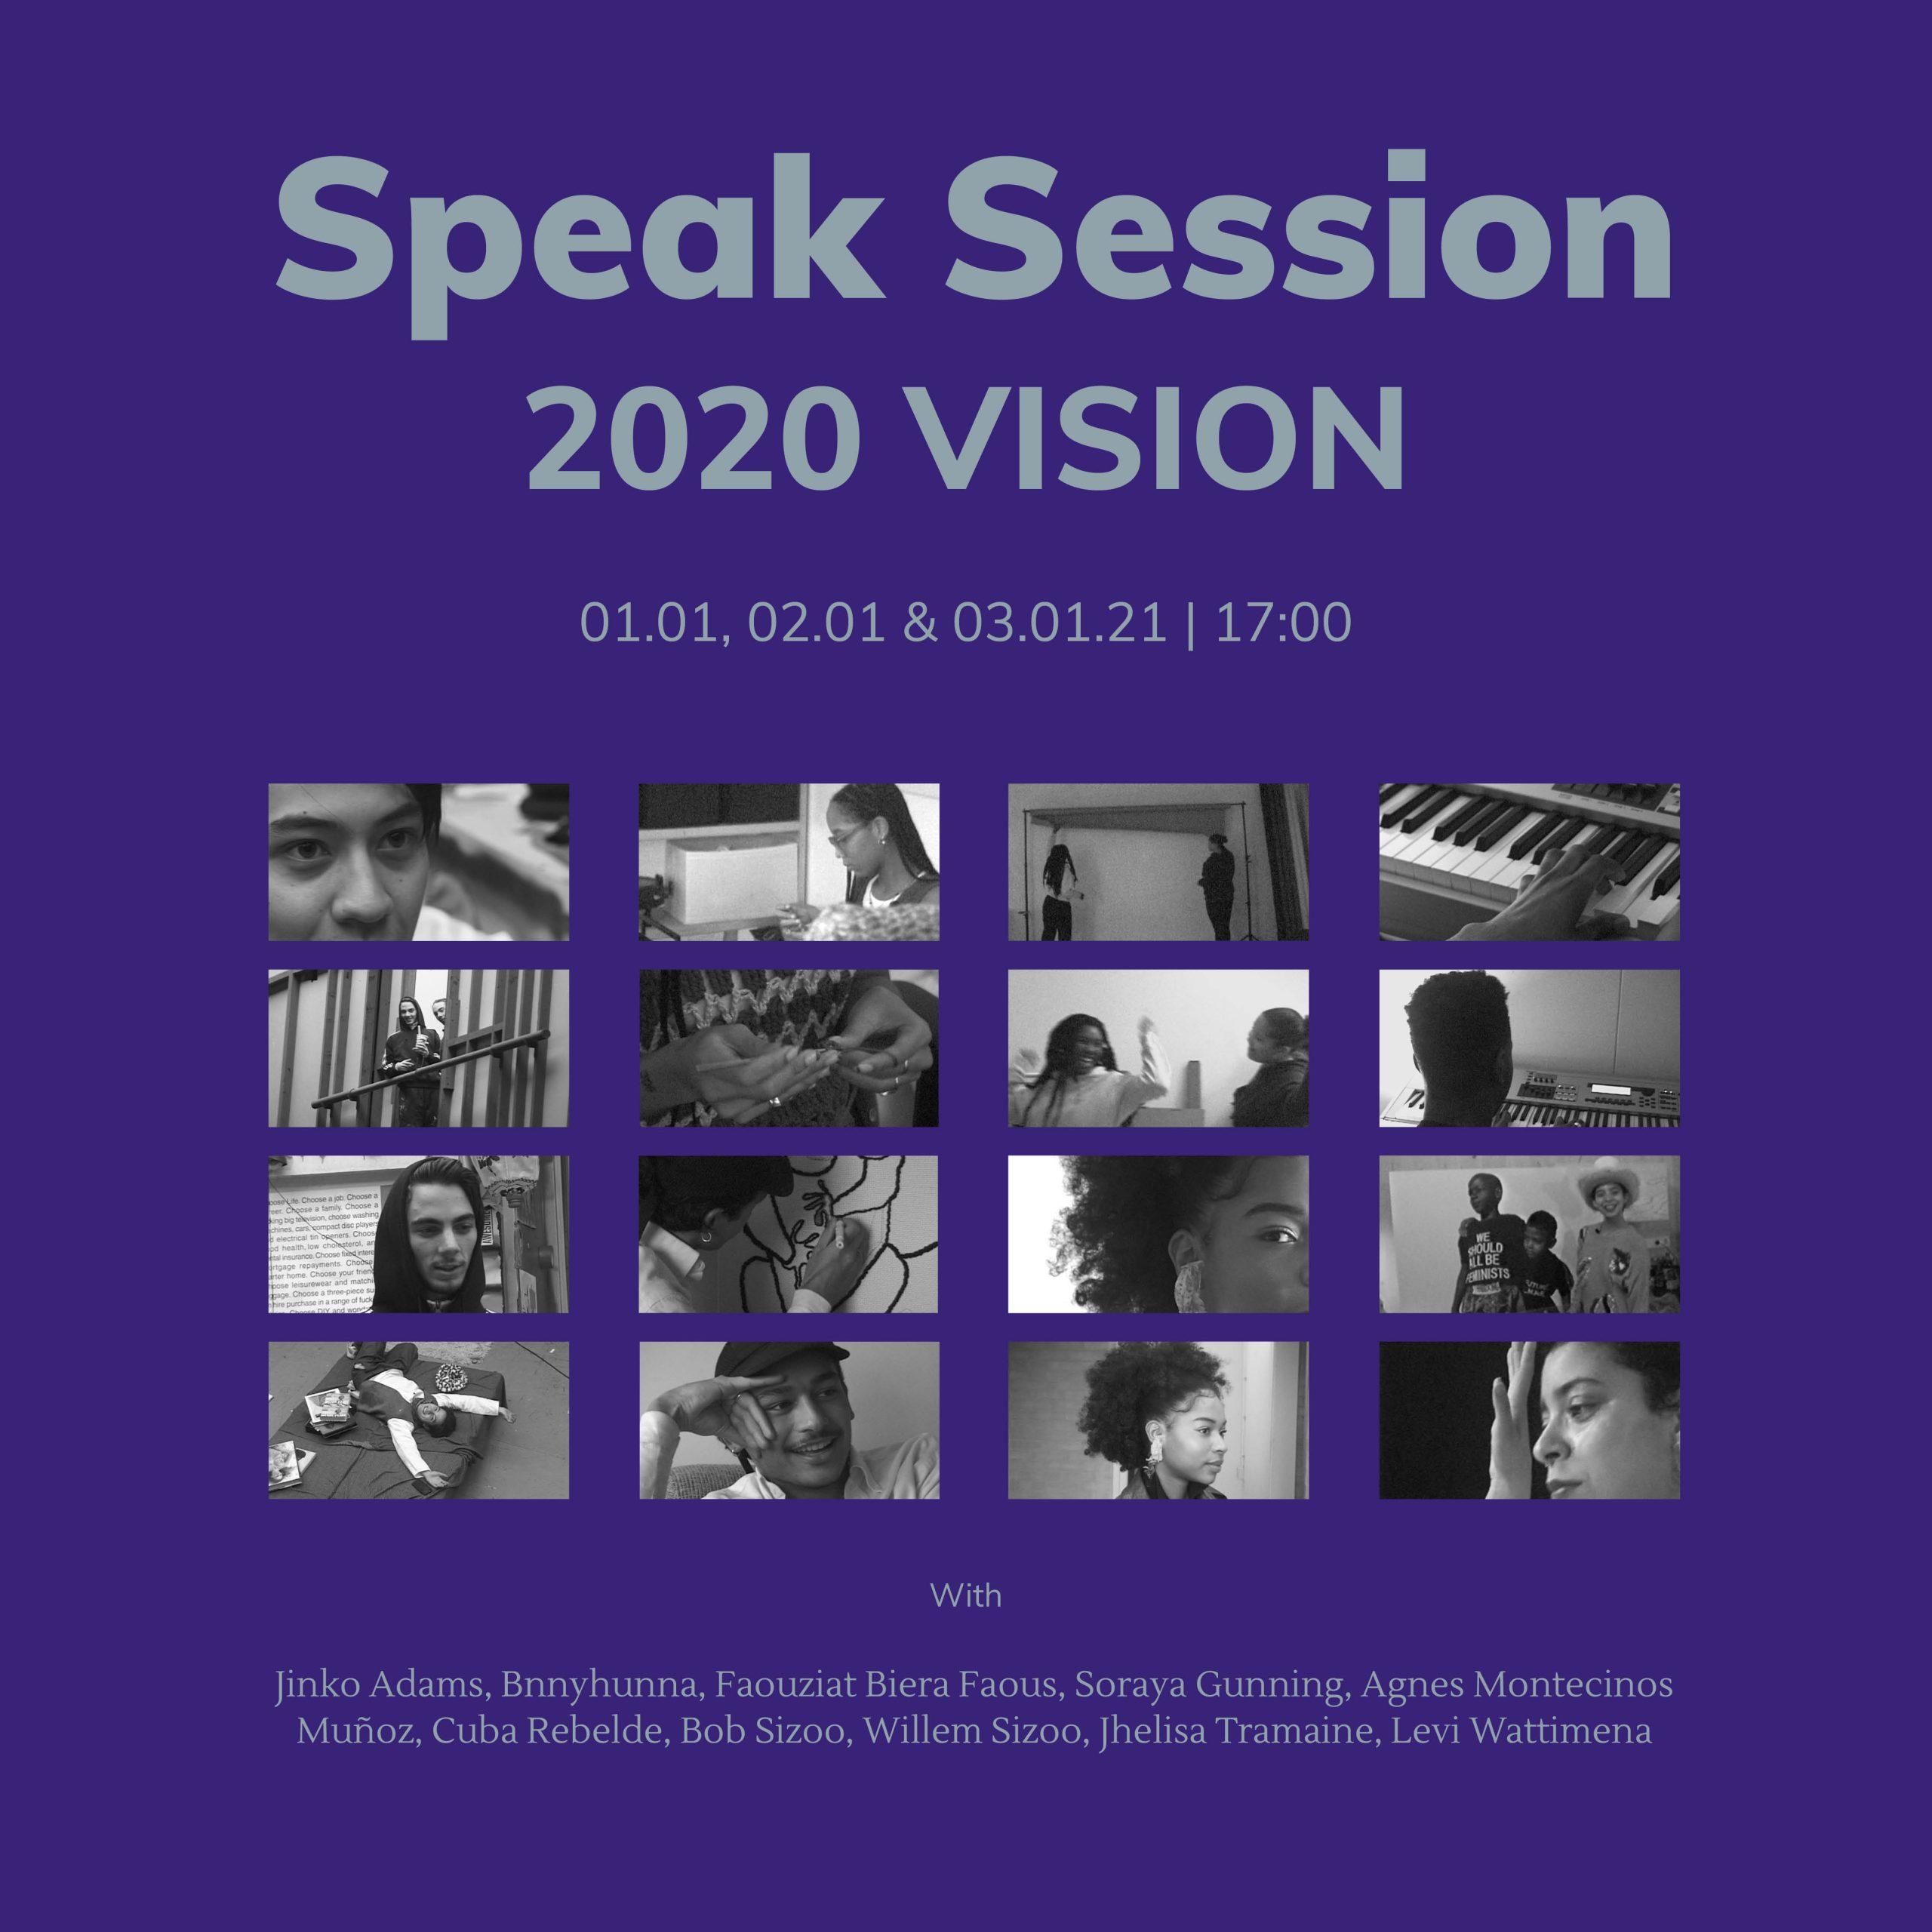 Speak Session x 2020 VISION